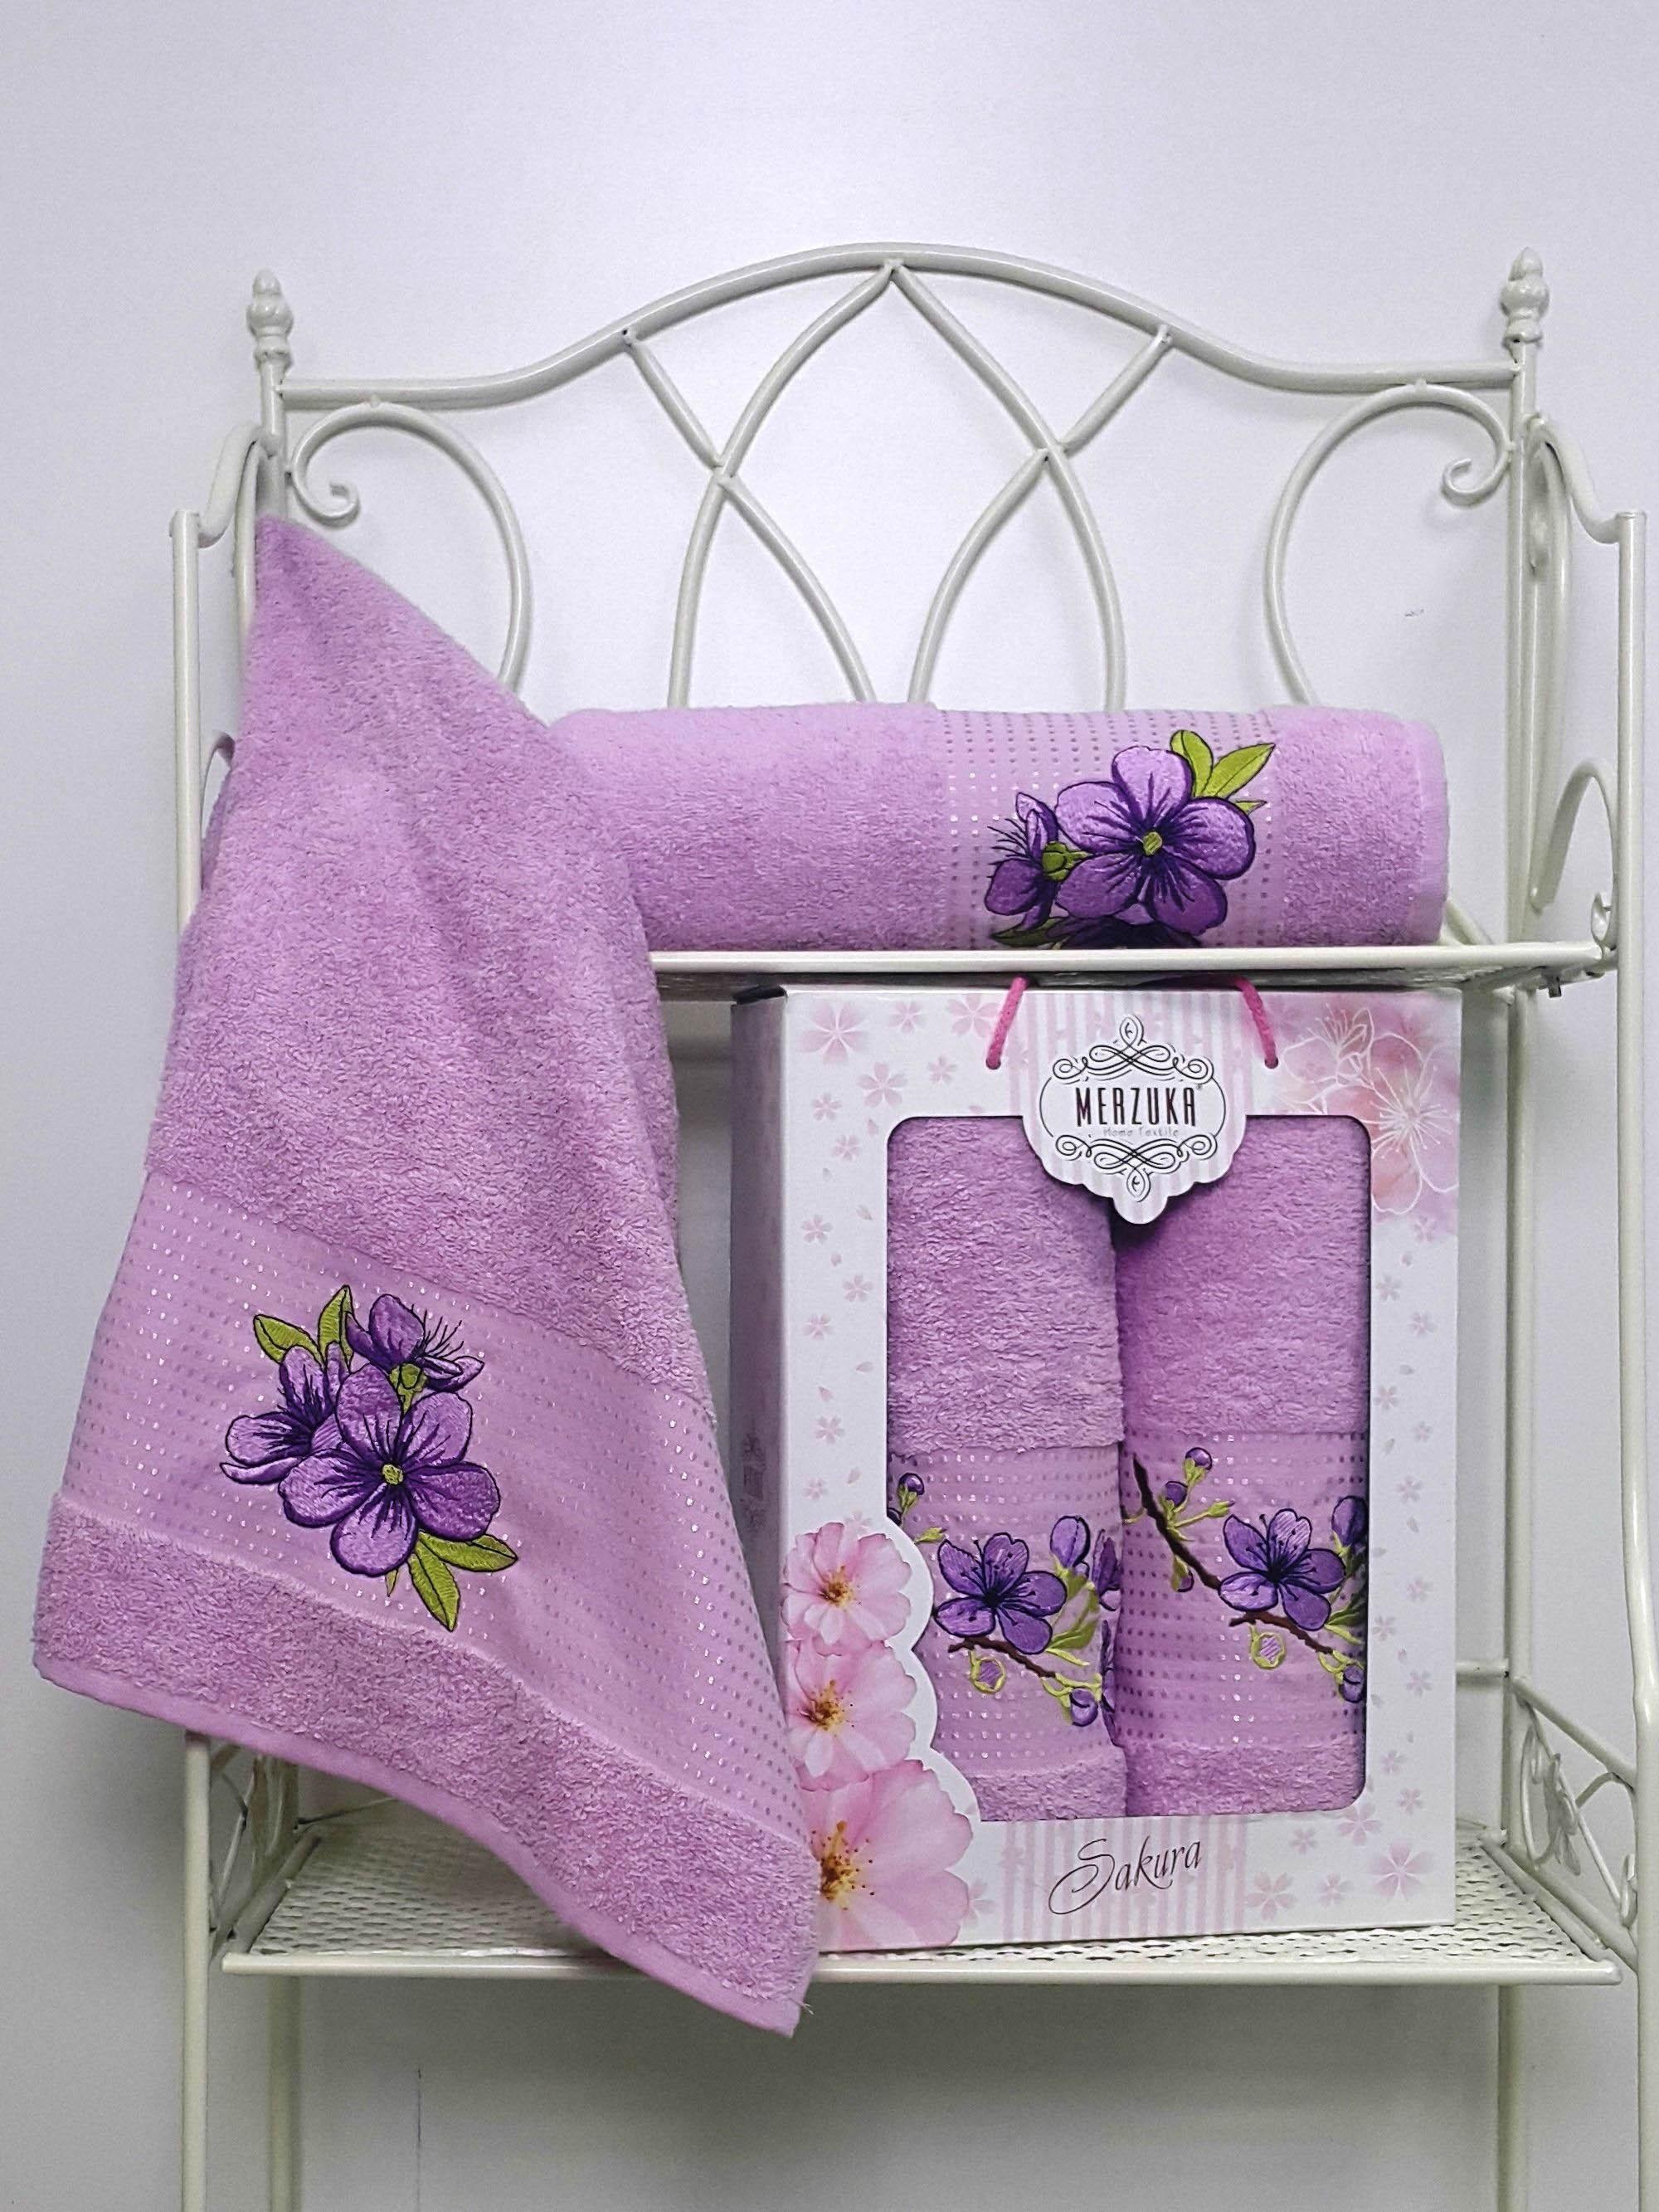 Полотенца Oran Merzuka Полотенце Sakura Цвет: Сиреневый (Набор) набор из 3 полотенец merzuka sakura 50х90 2 70х140 8432 розовый